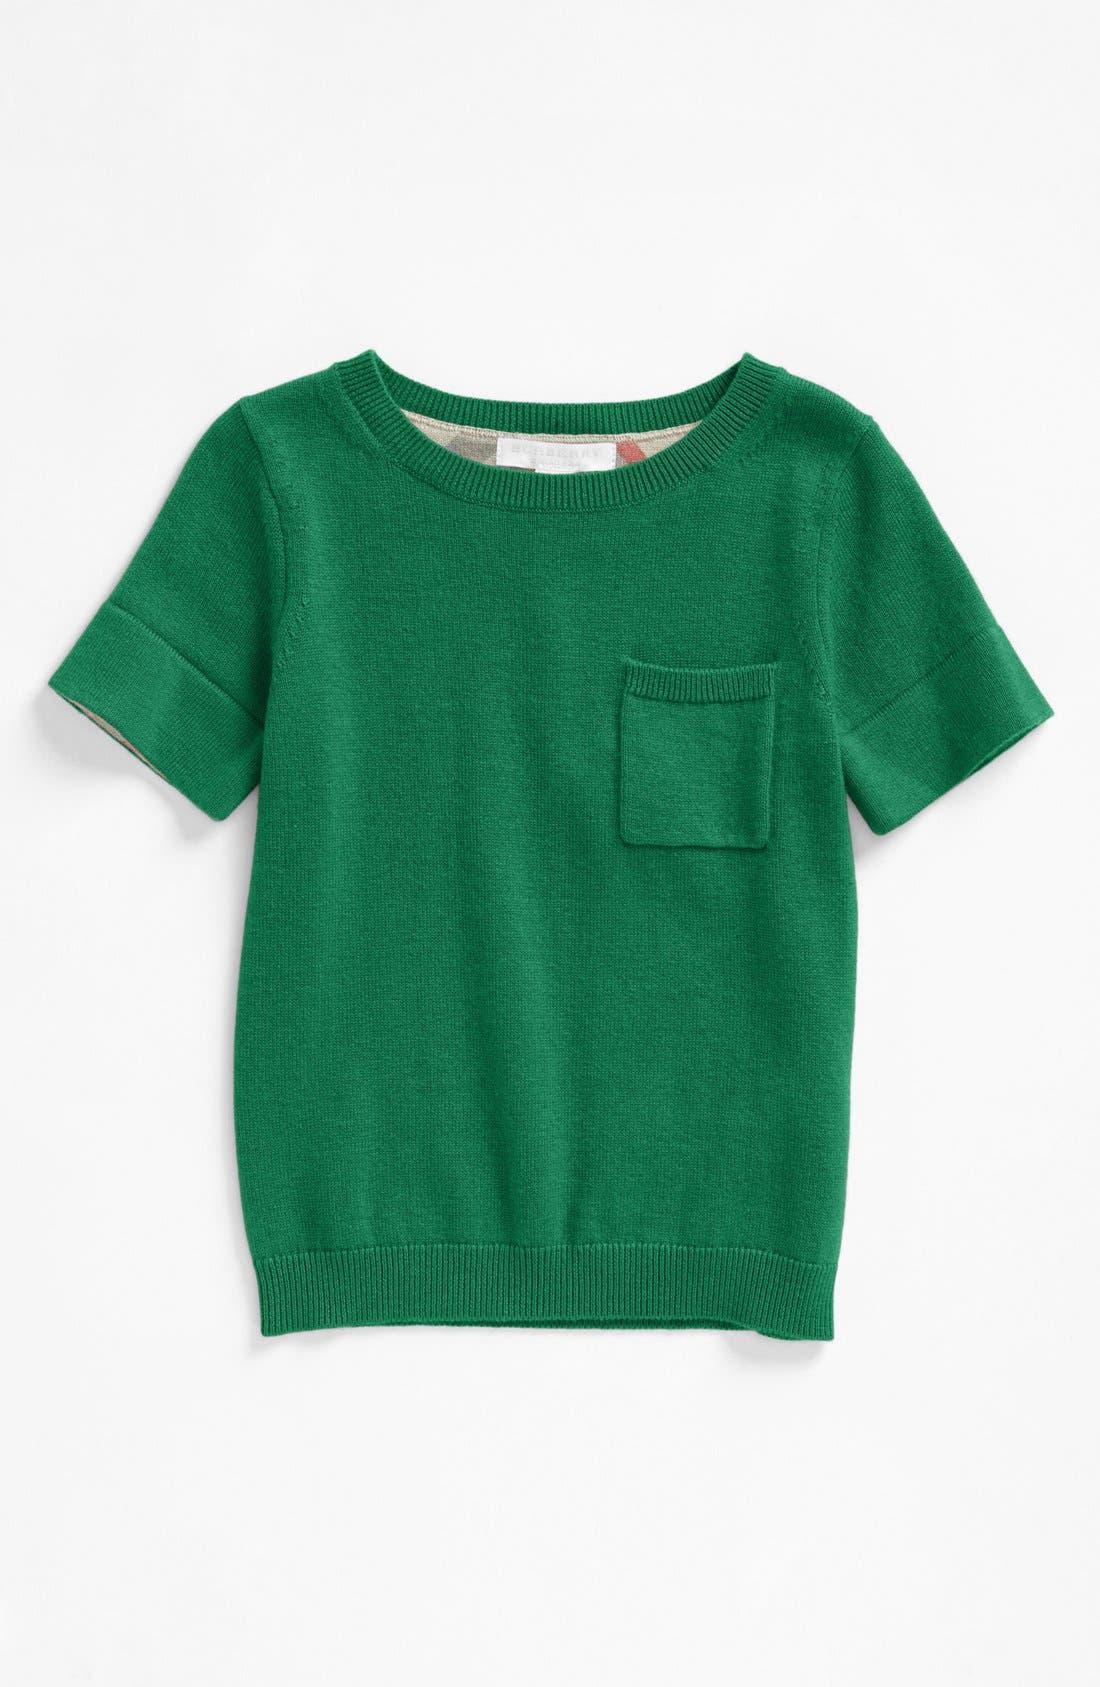 Alternate Image 1 Selected - Burberry 'Talie' Sweater (Little Girls & Big Girls)